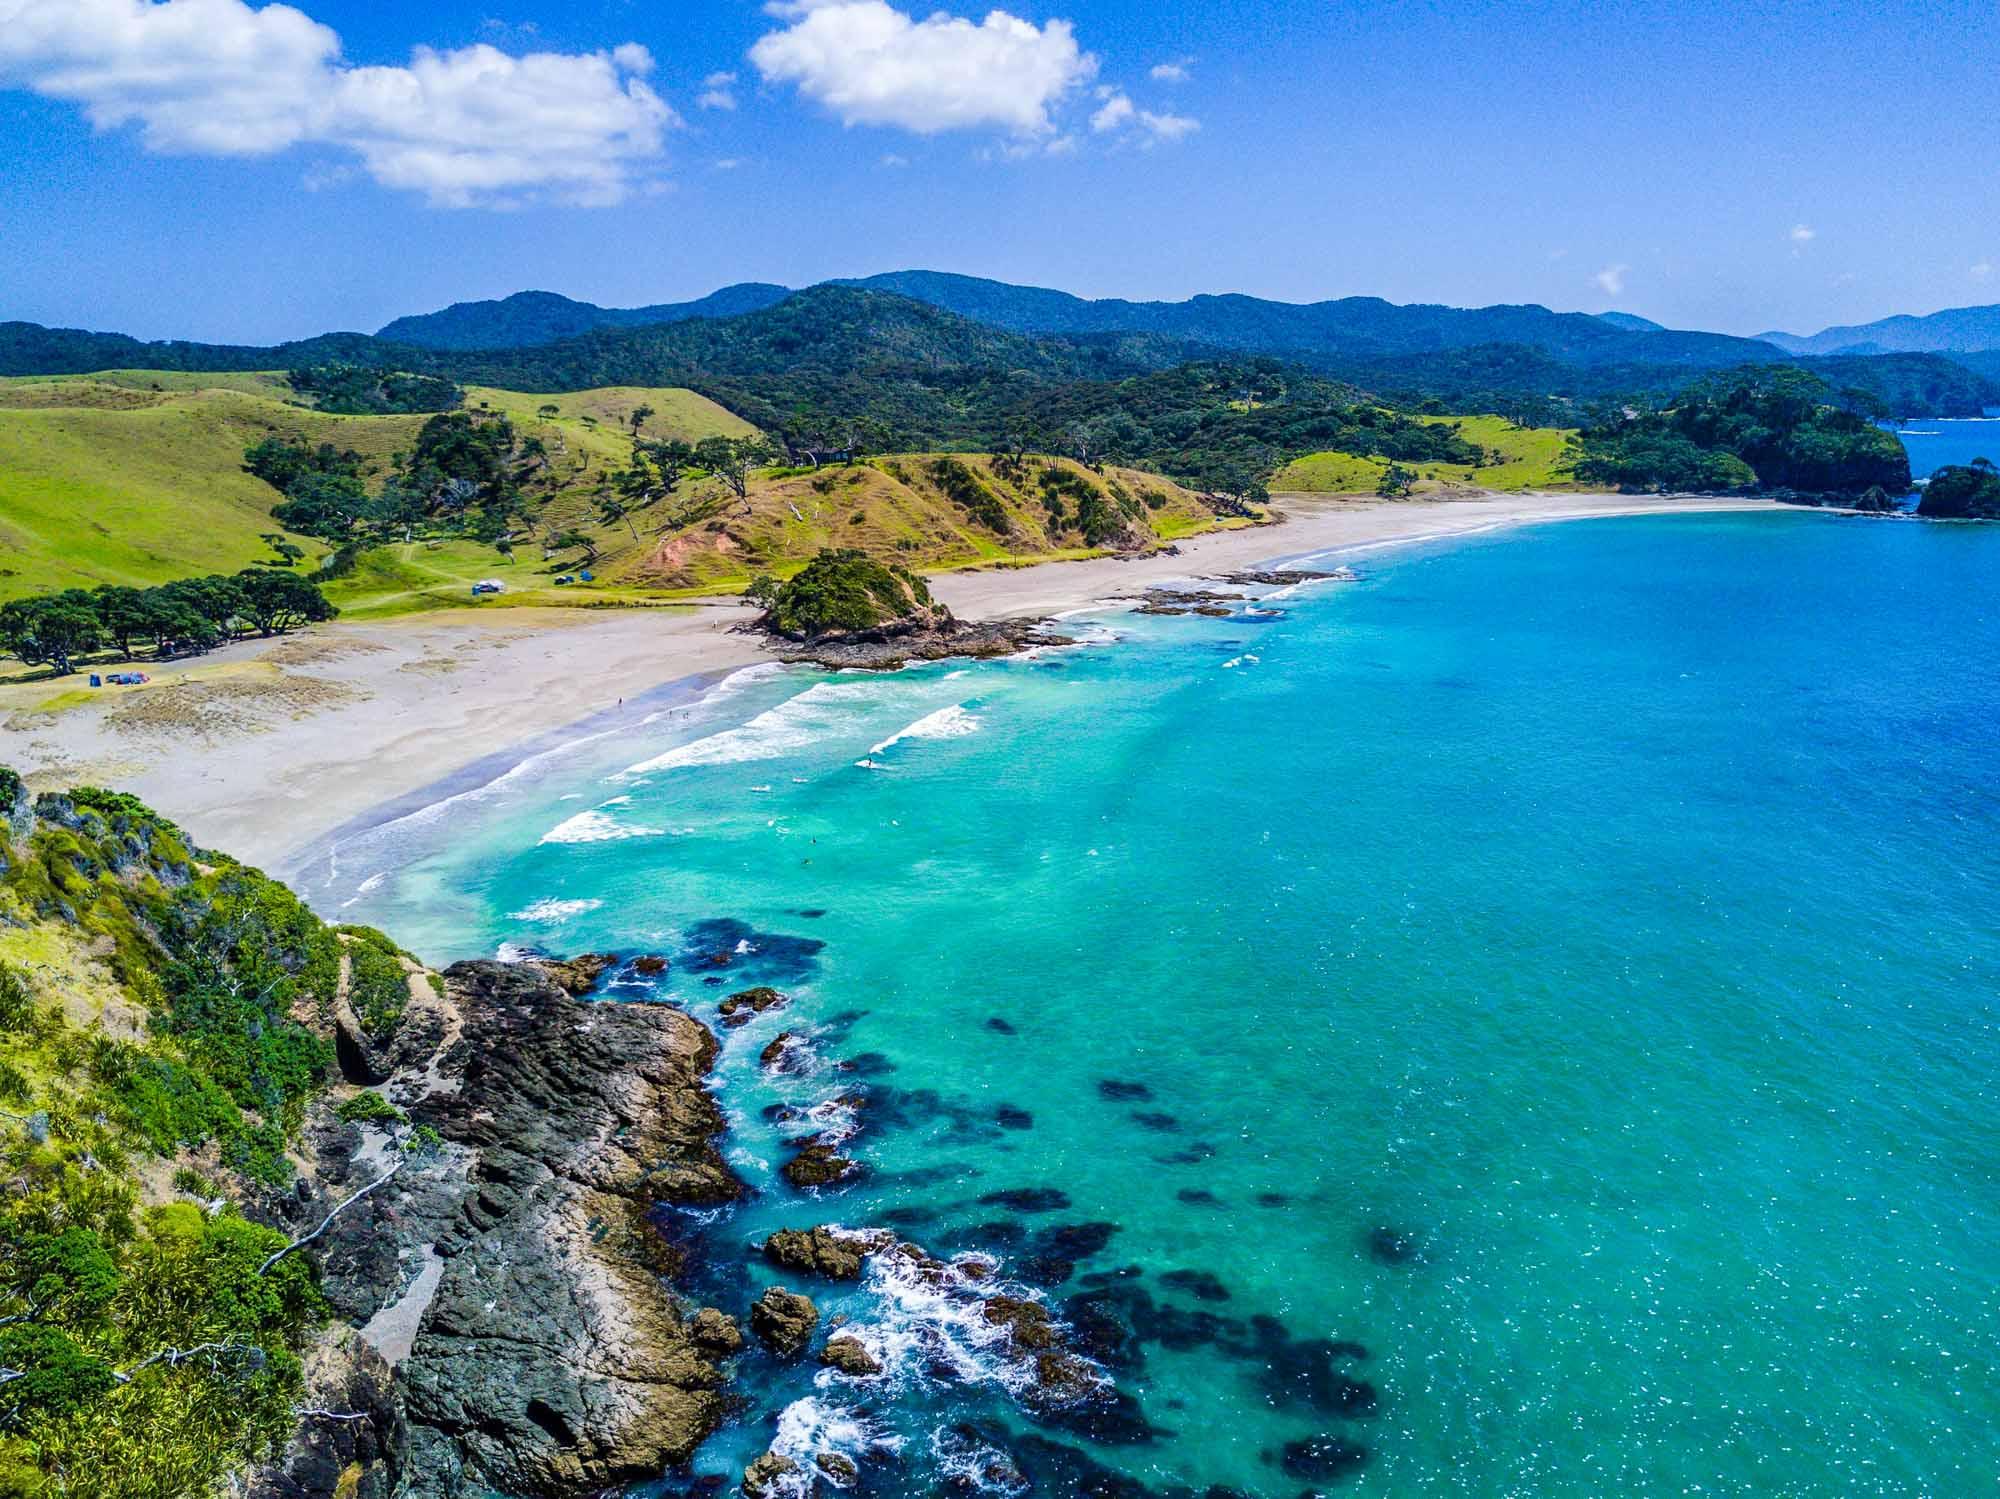 Sunshine in December: New Zealand